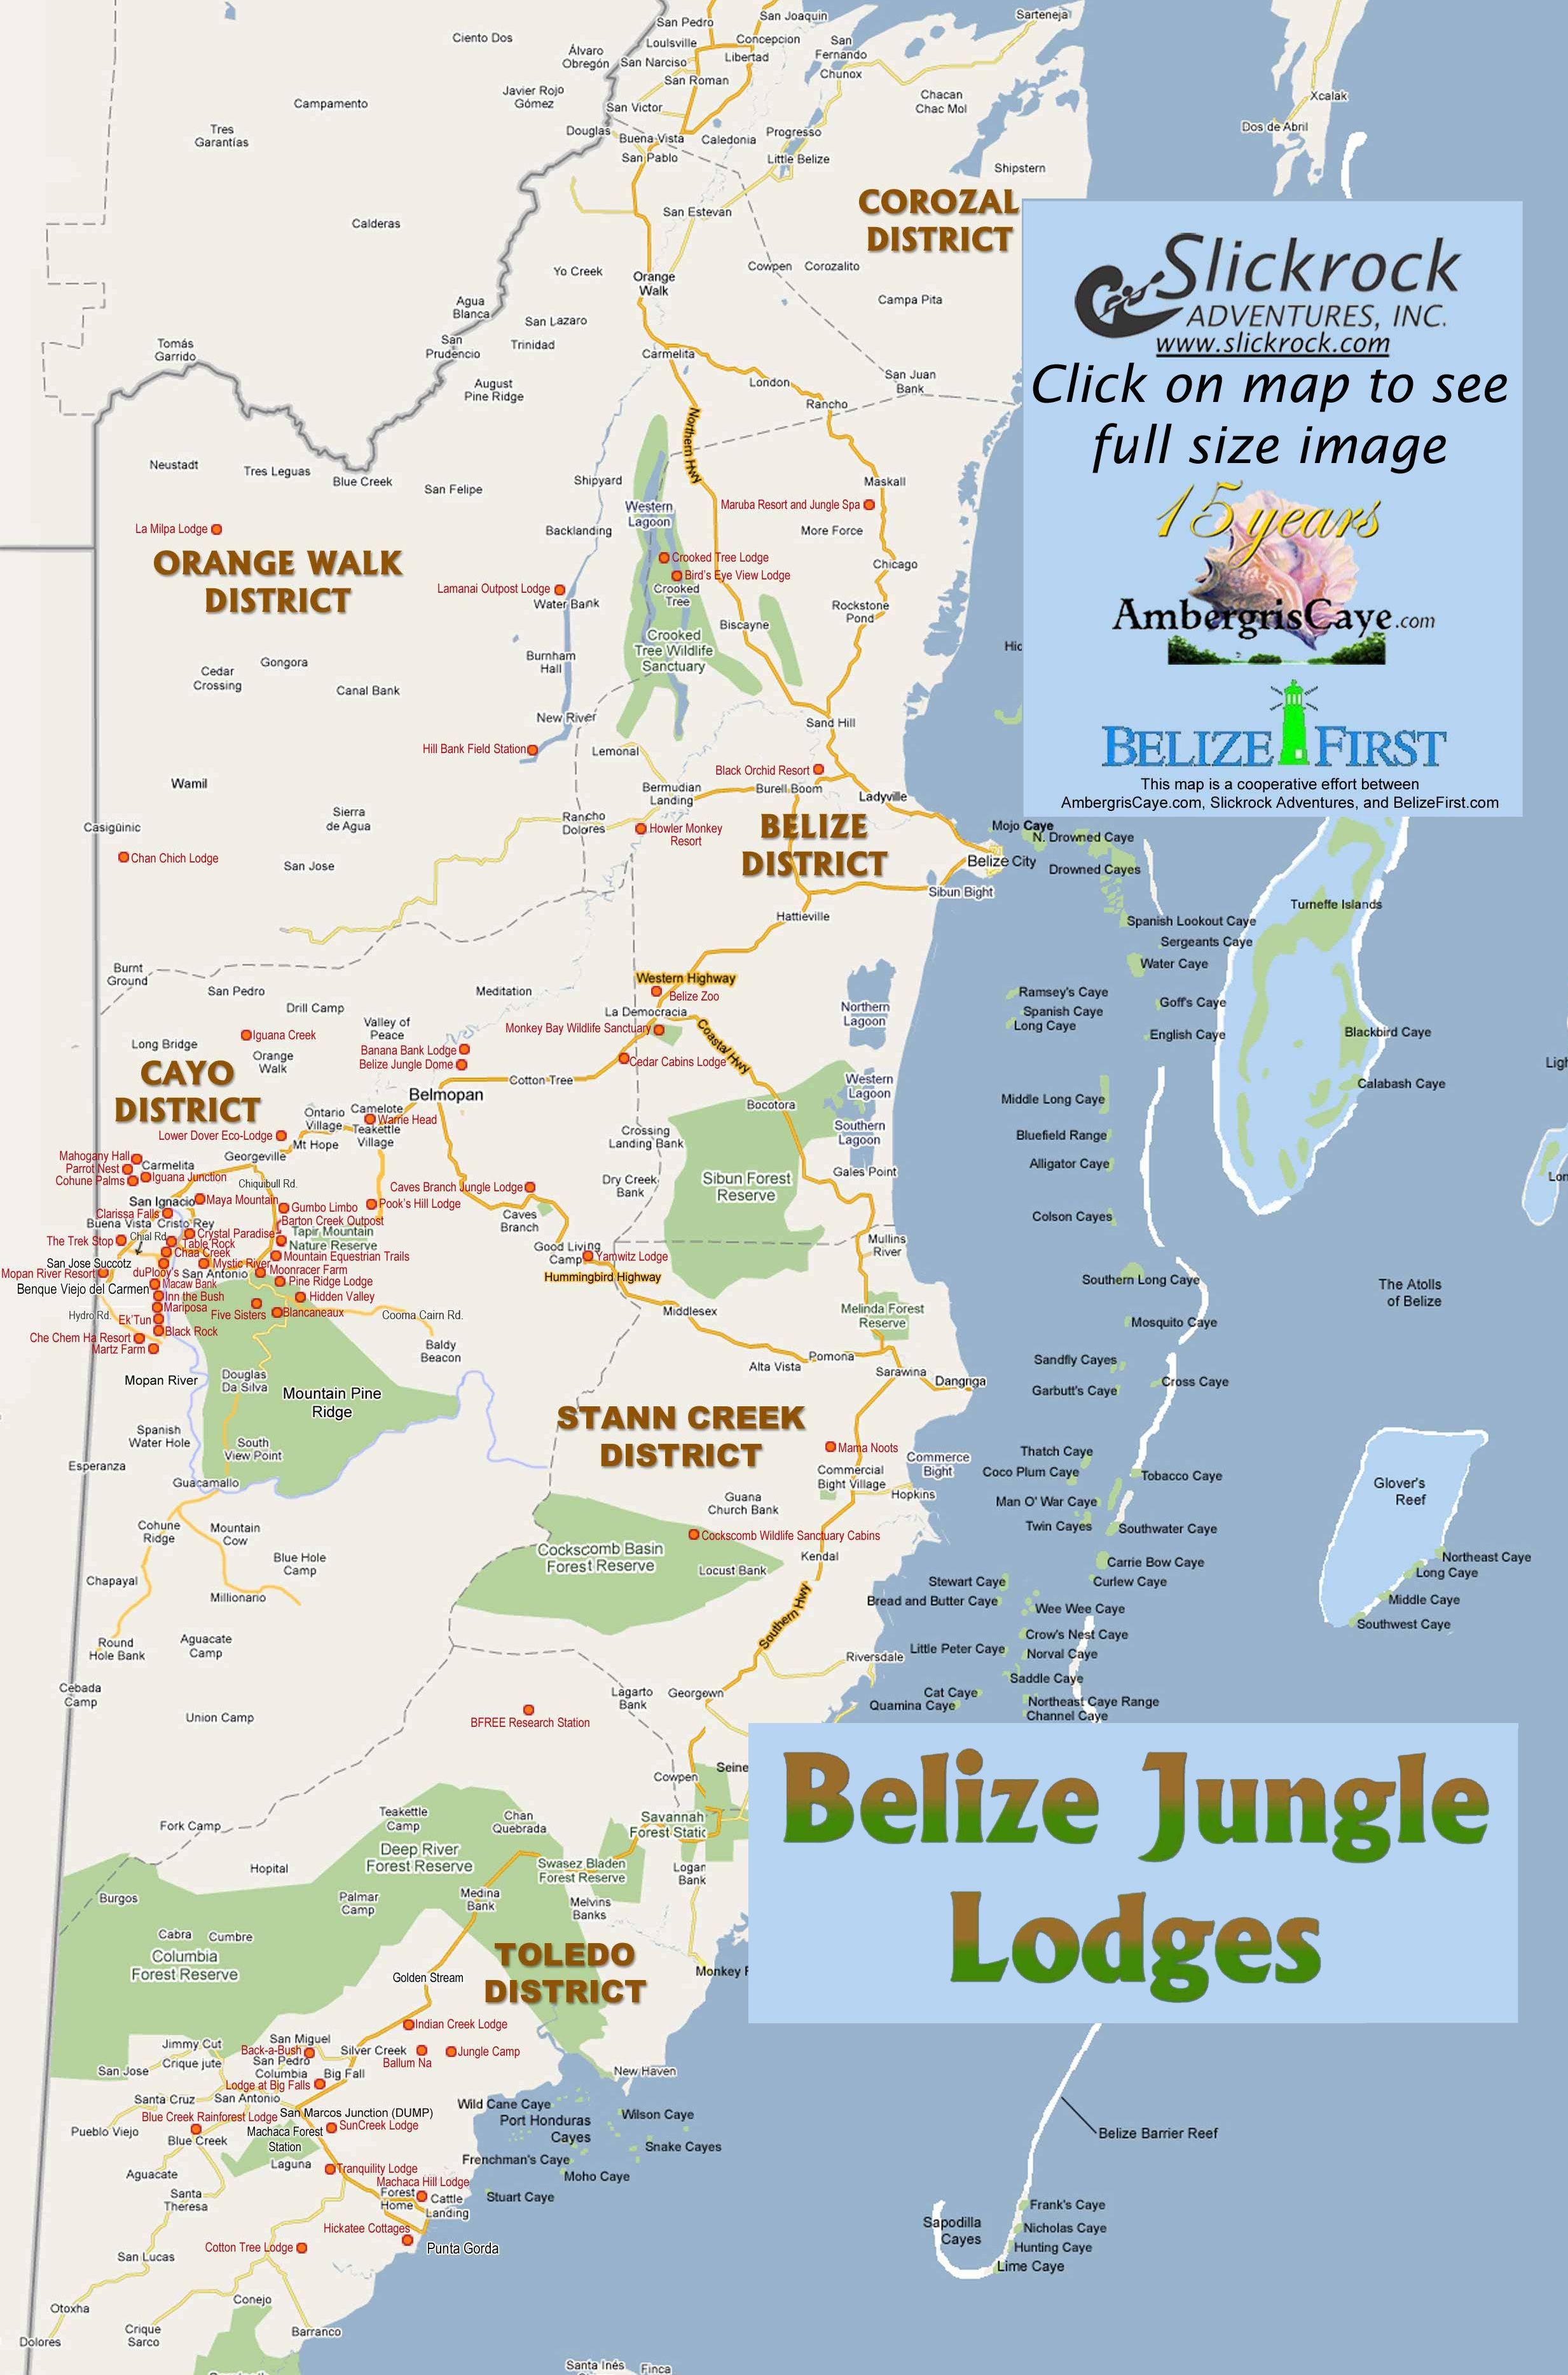 Belize jungle lodges map belize pinterest lugares belize jungle lodges map gumiabroncs Image collections